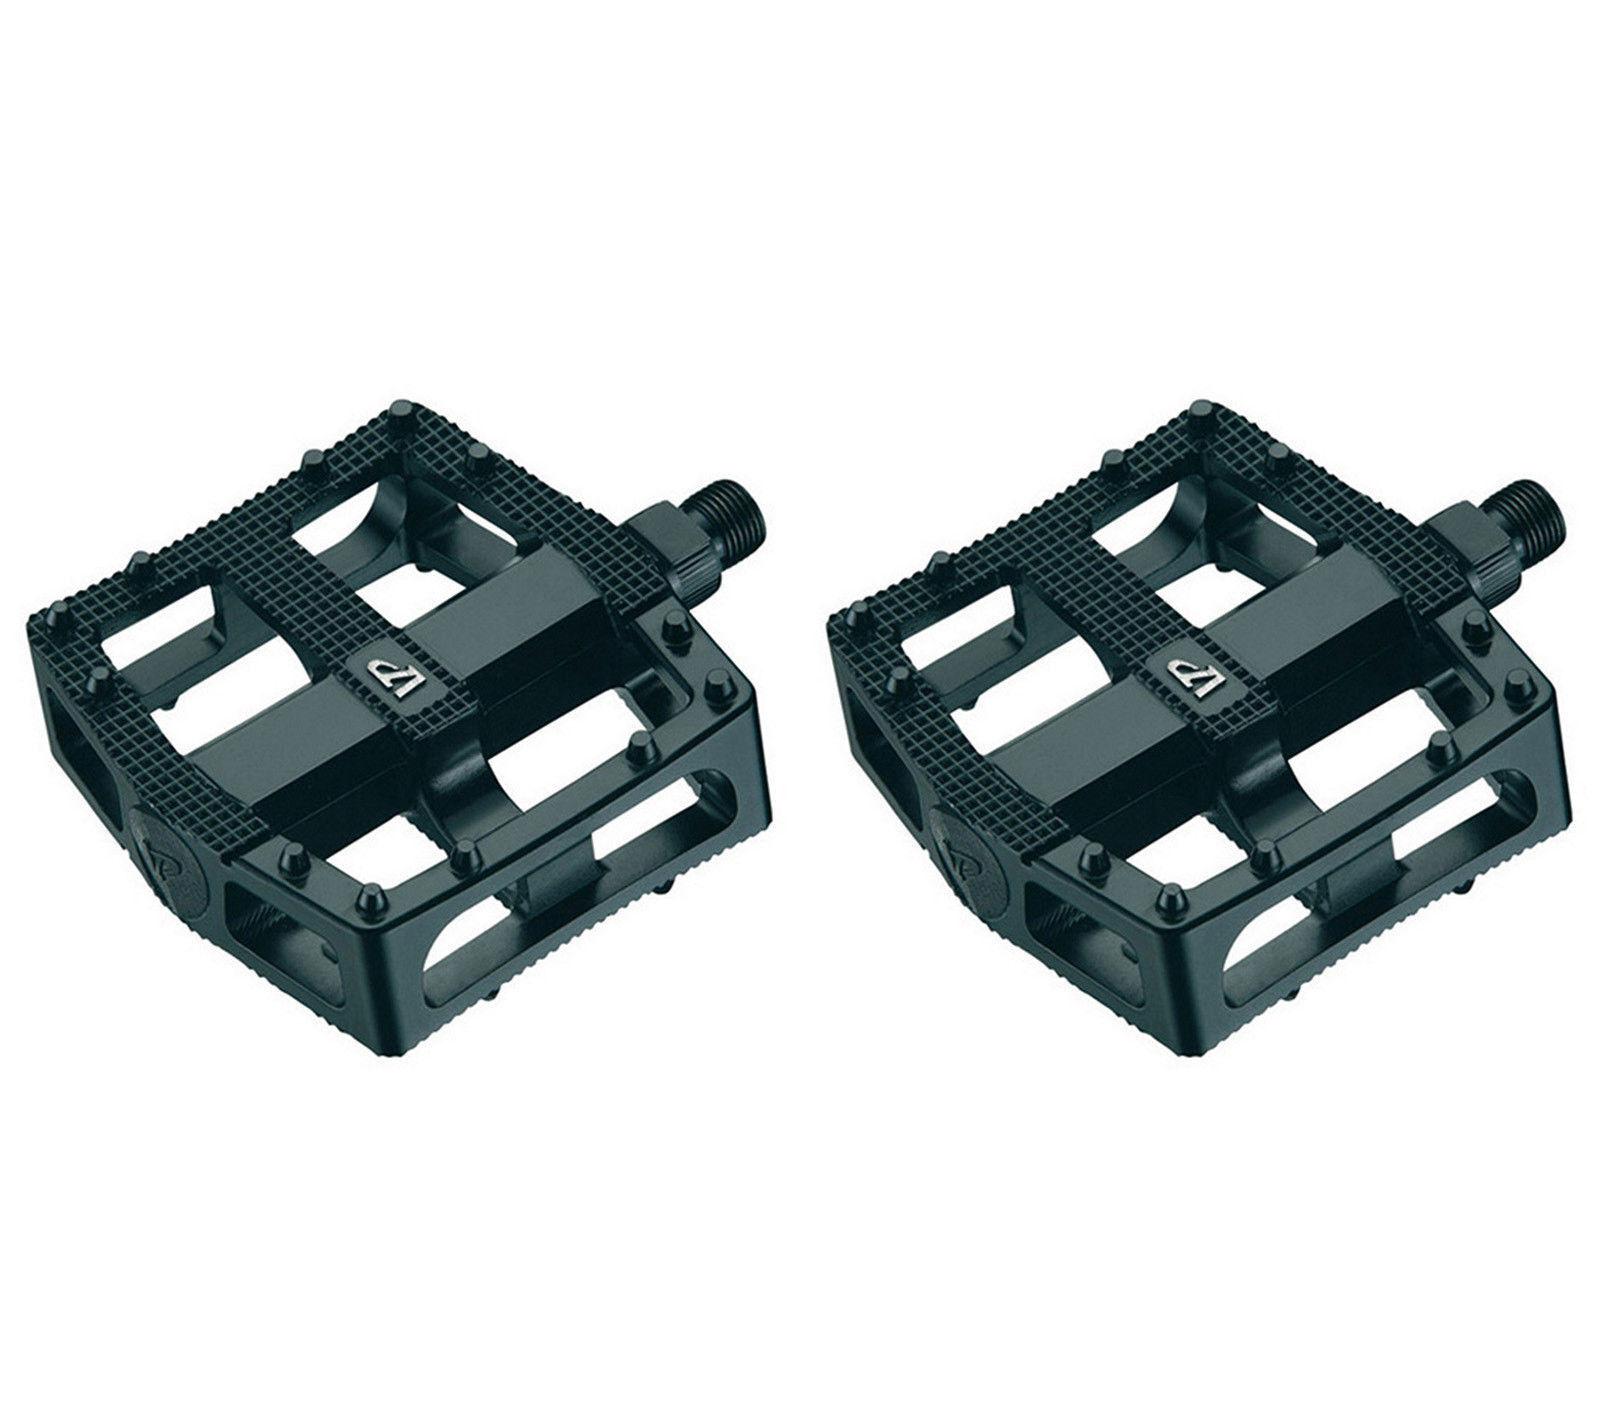 Pedales para Bicicleta BMX Free Style DIRT JUMP Eje CR-MO Aluminio CNC 6061 3534